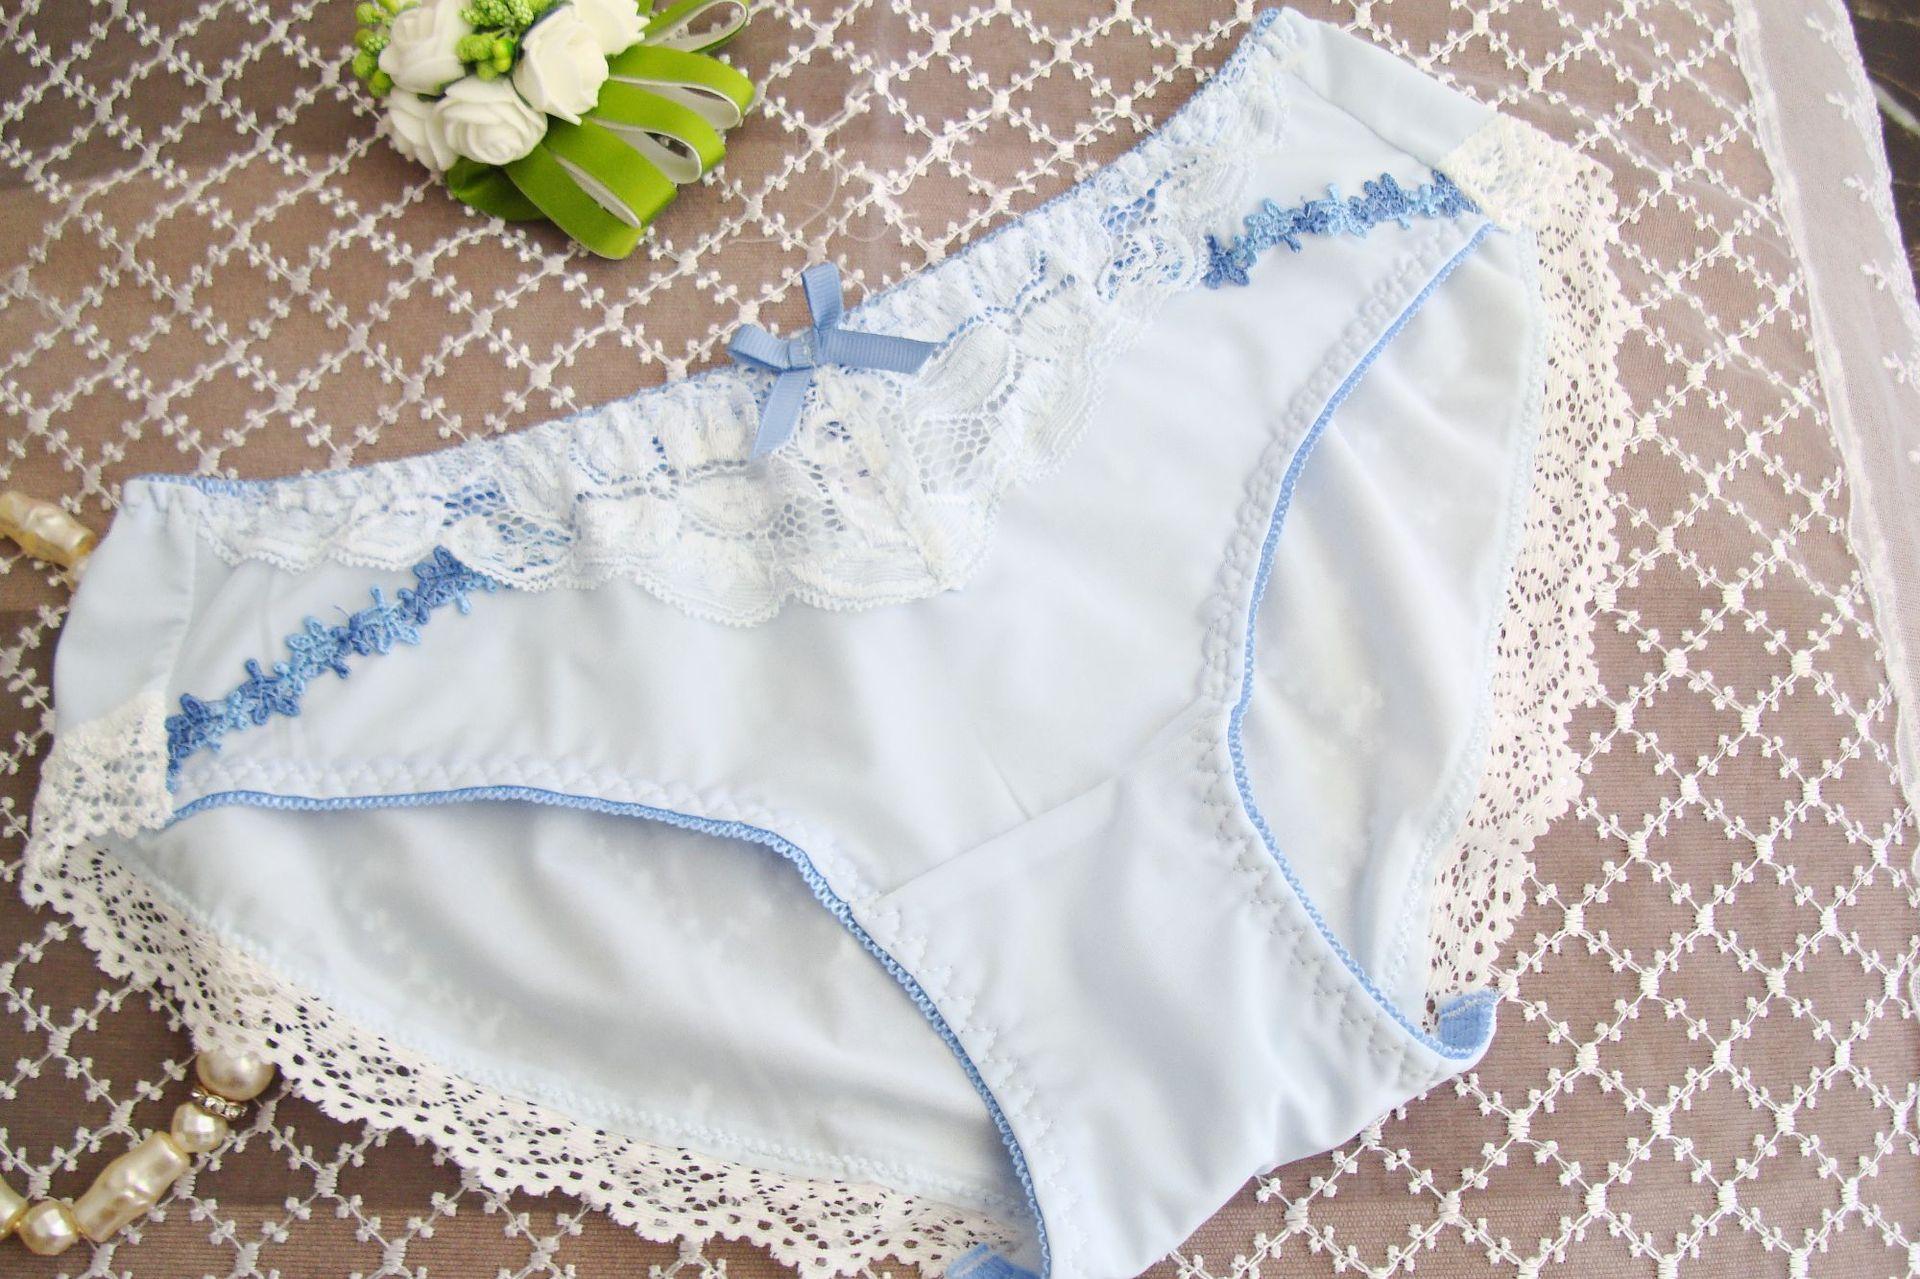 3cefcd47f3d #S024 wholesale 5pcs Japanese style Tokyo panties women's sexy underwear  lingerie quick dry milk silk briefs underpants. Flash Sales